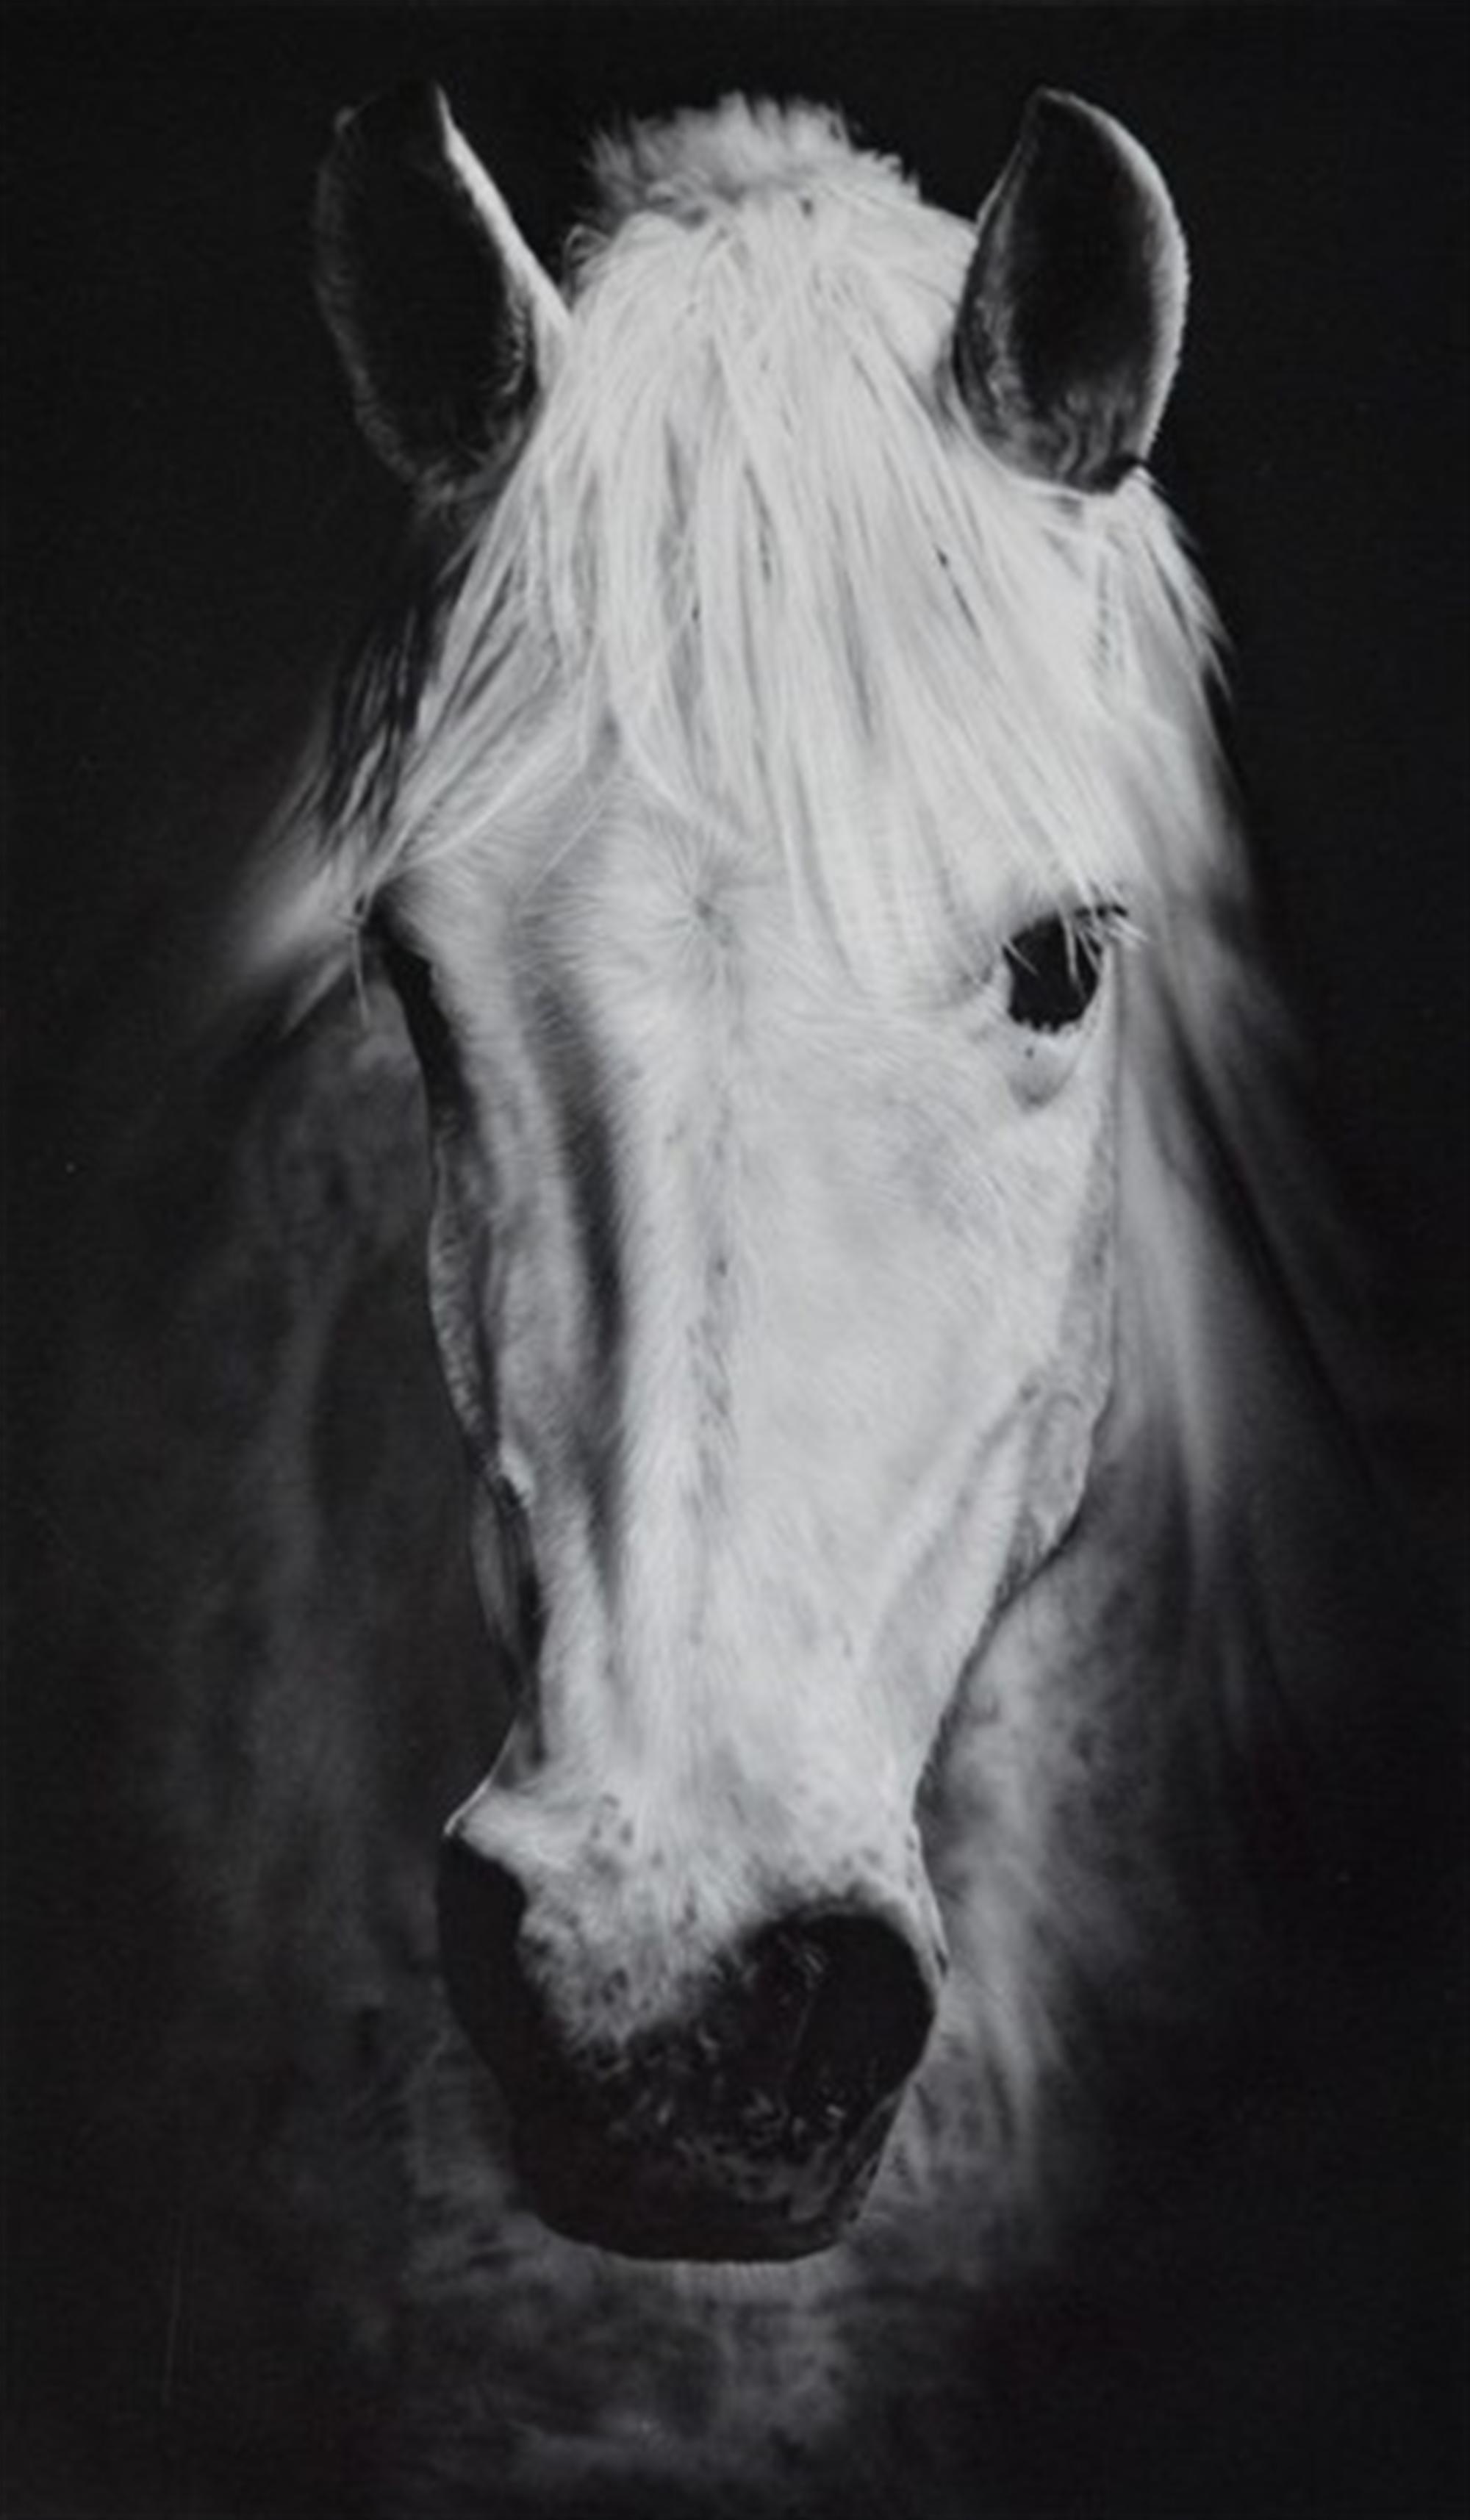 White Horse by Silvia Belviso